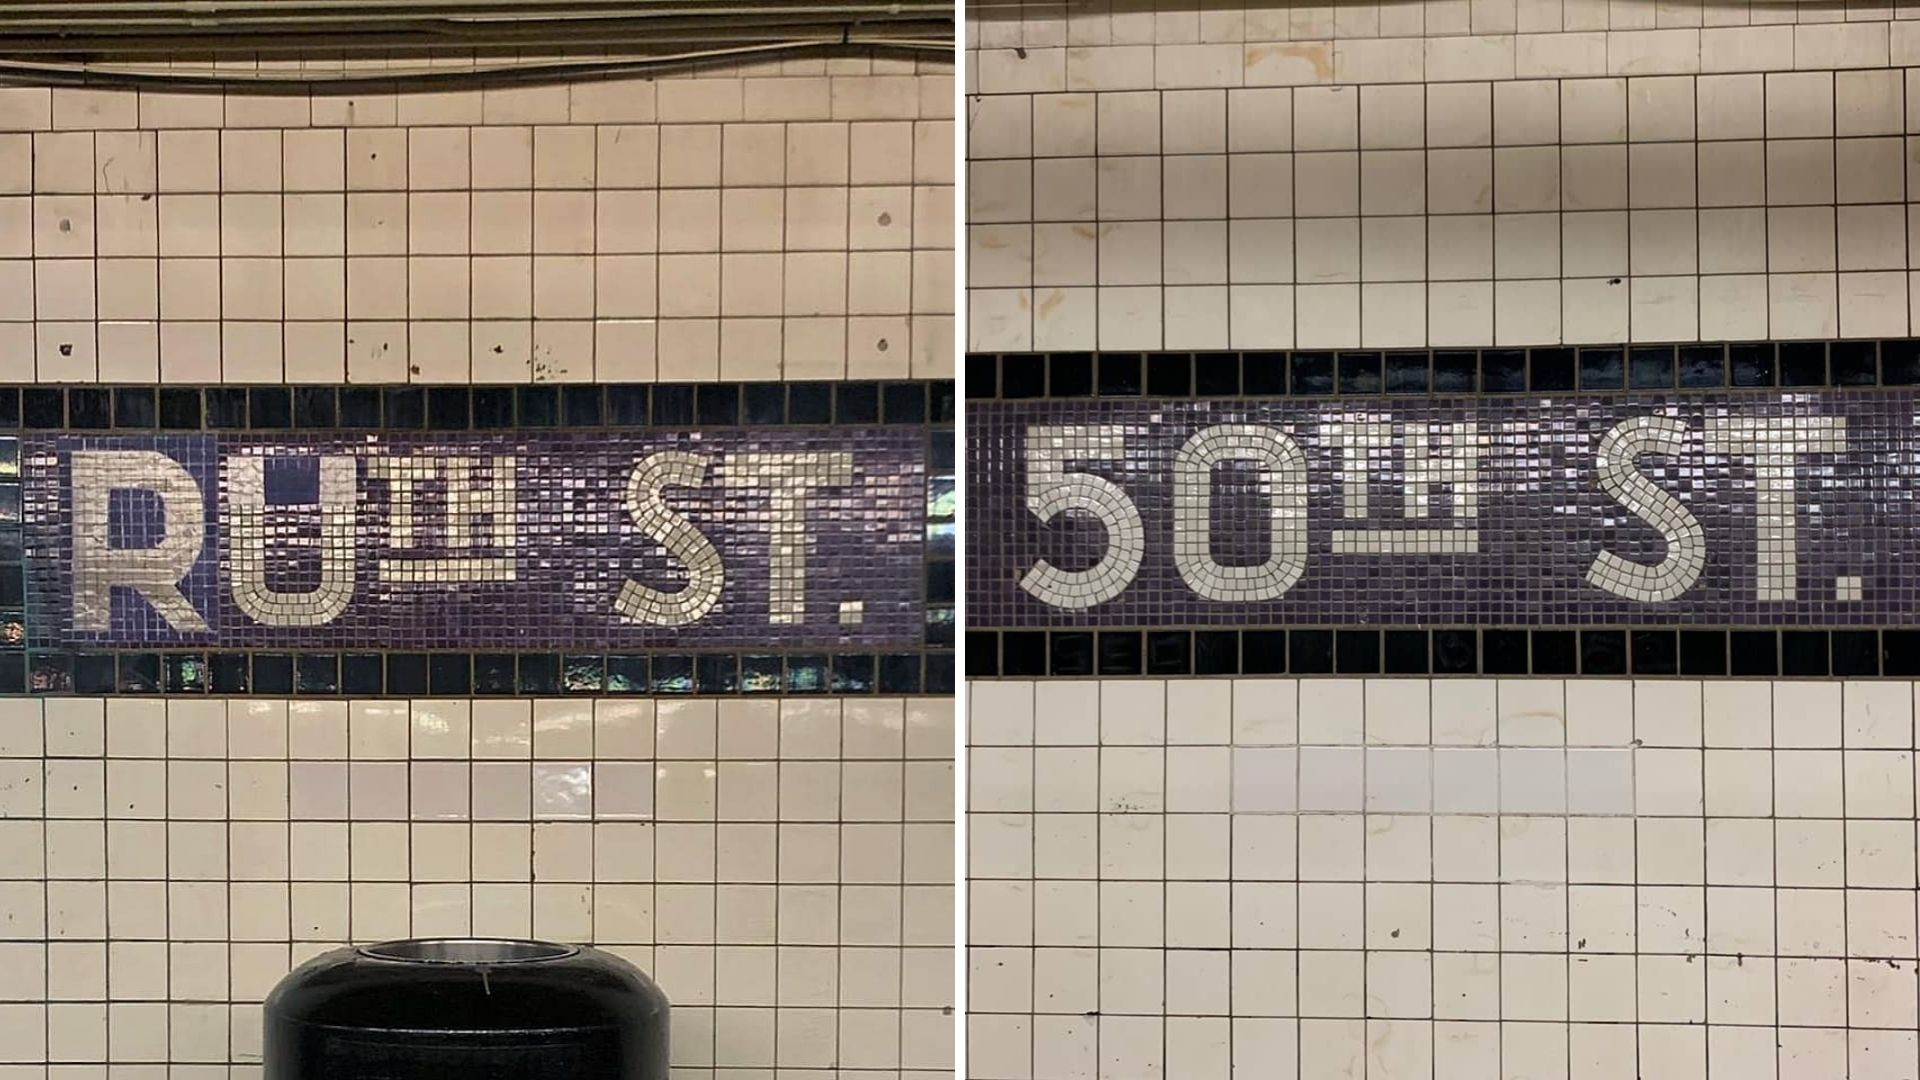 subway station renamed ruth street